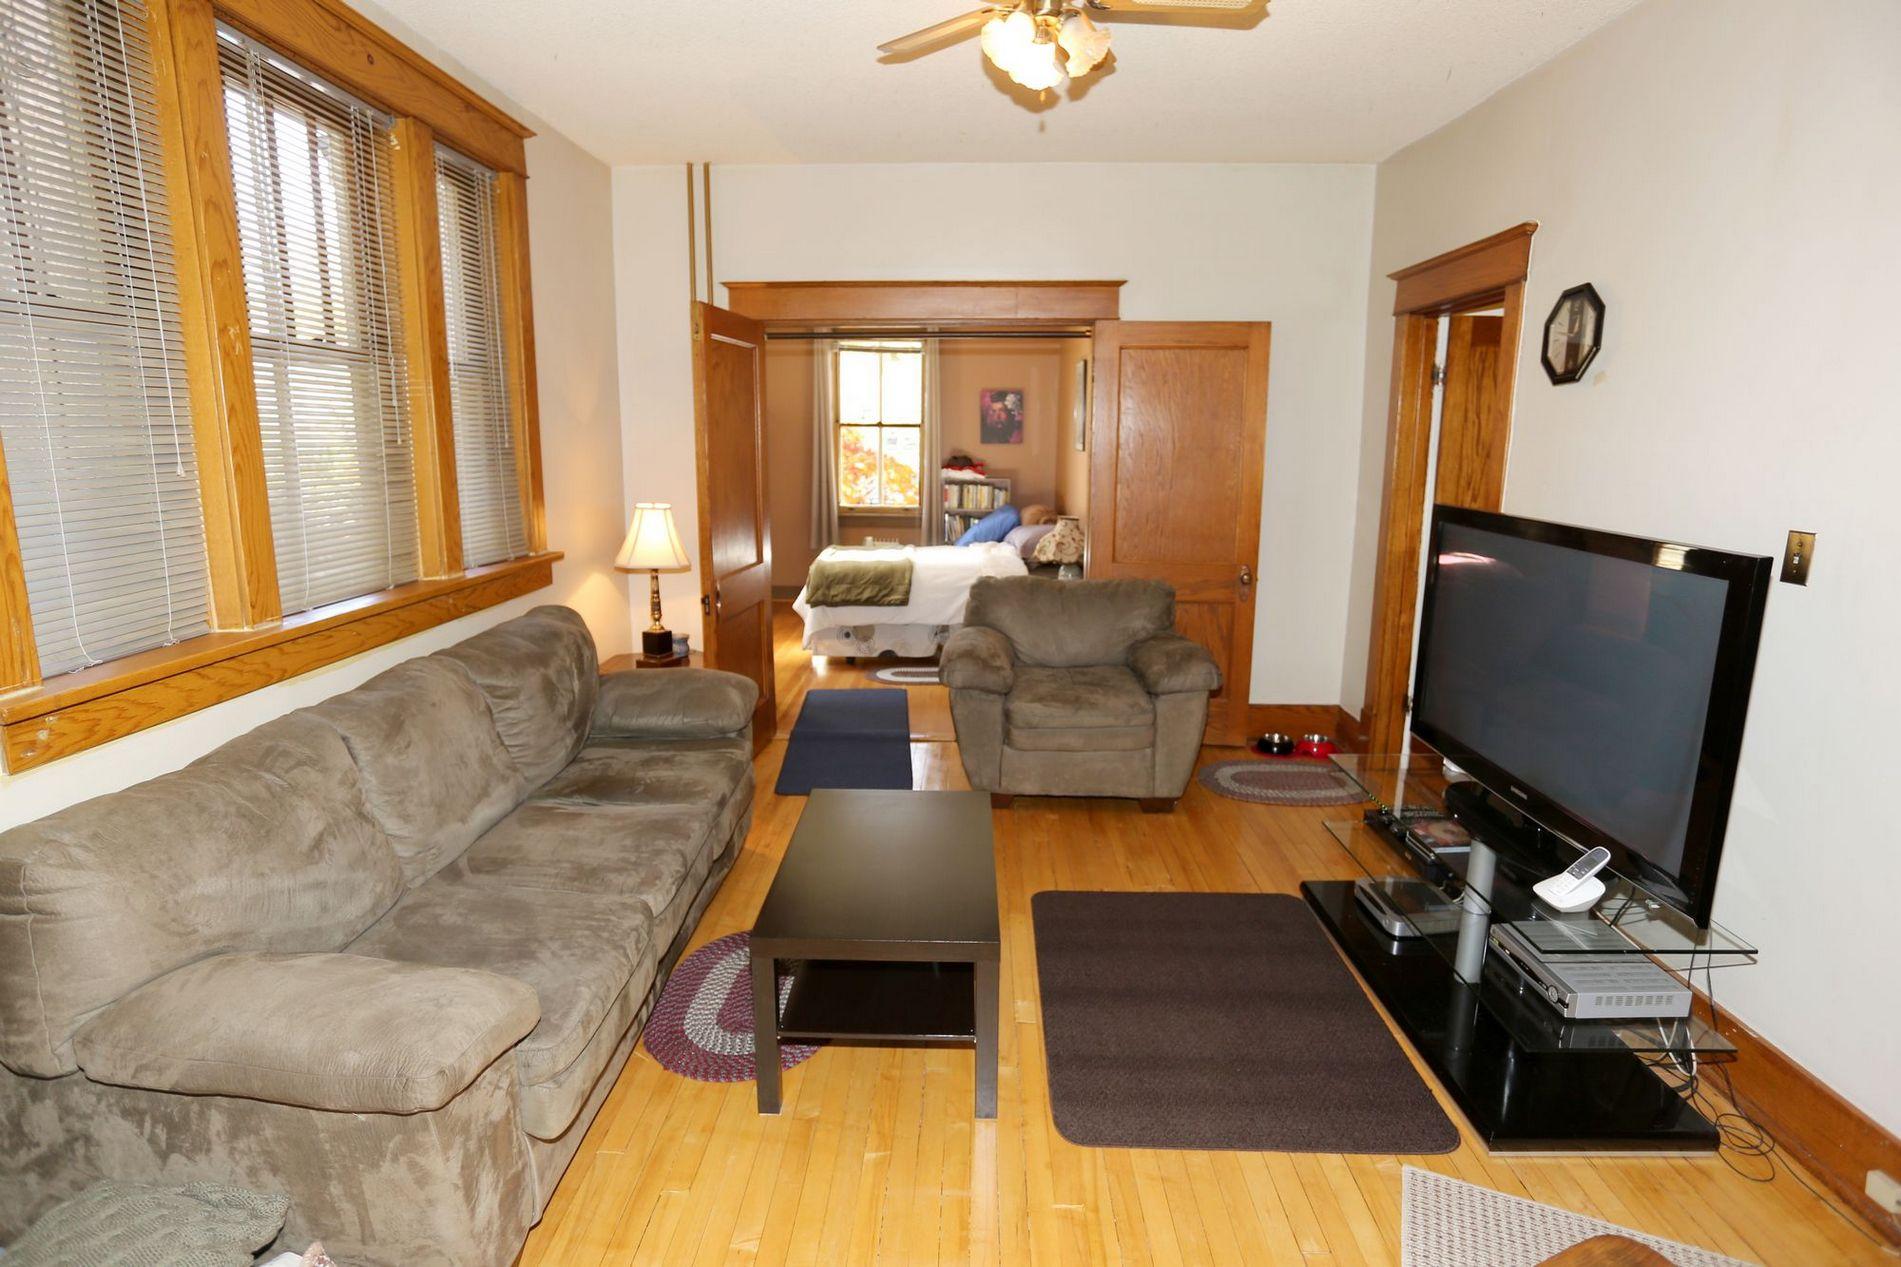 446 Greenwood Place, Winnipeg, Manitoba  R3G 2P3 - Photo 2 - 1726723